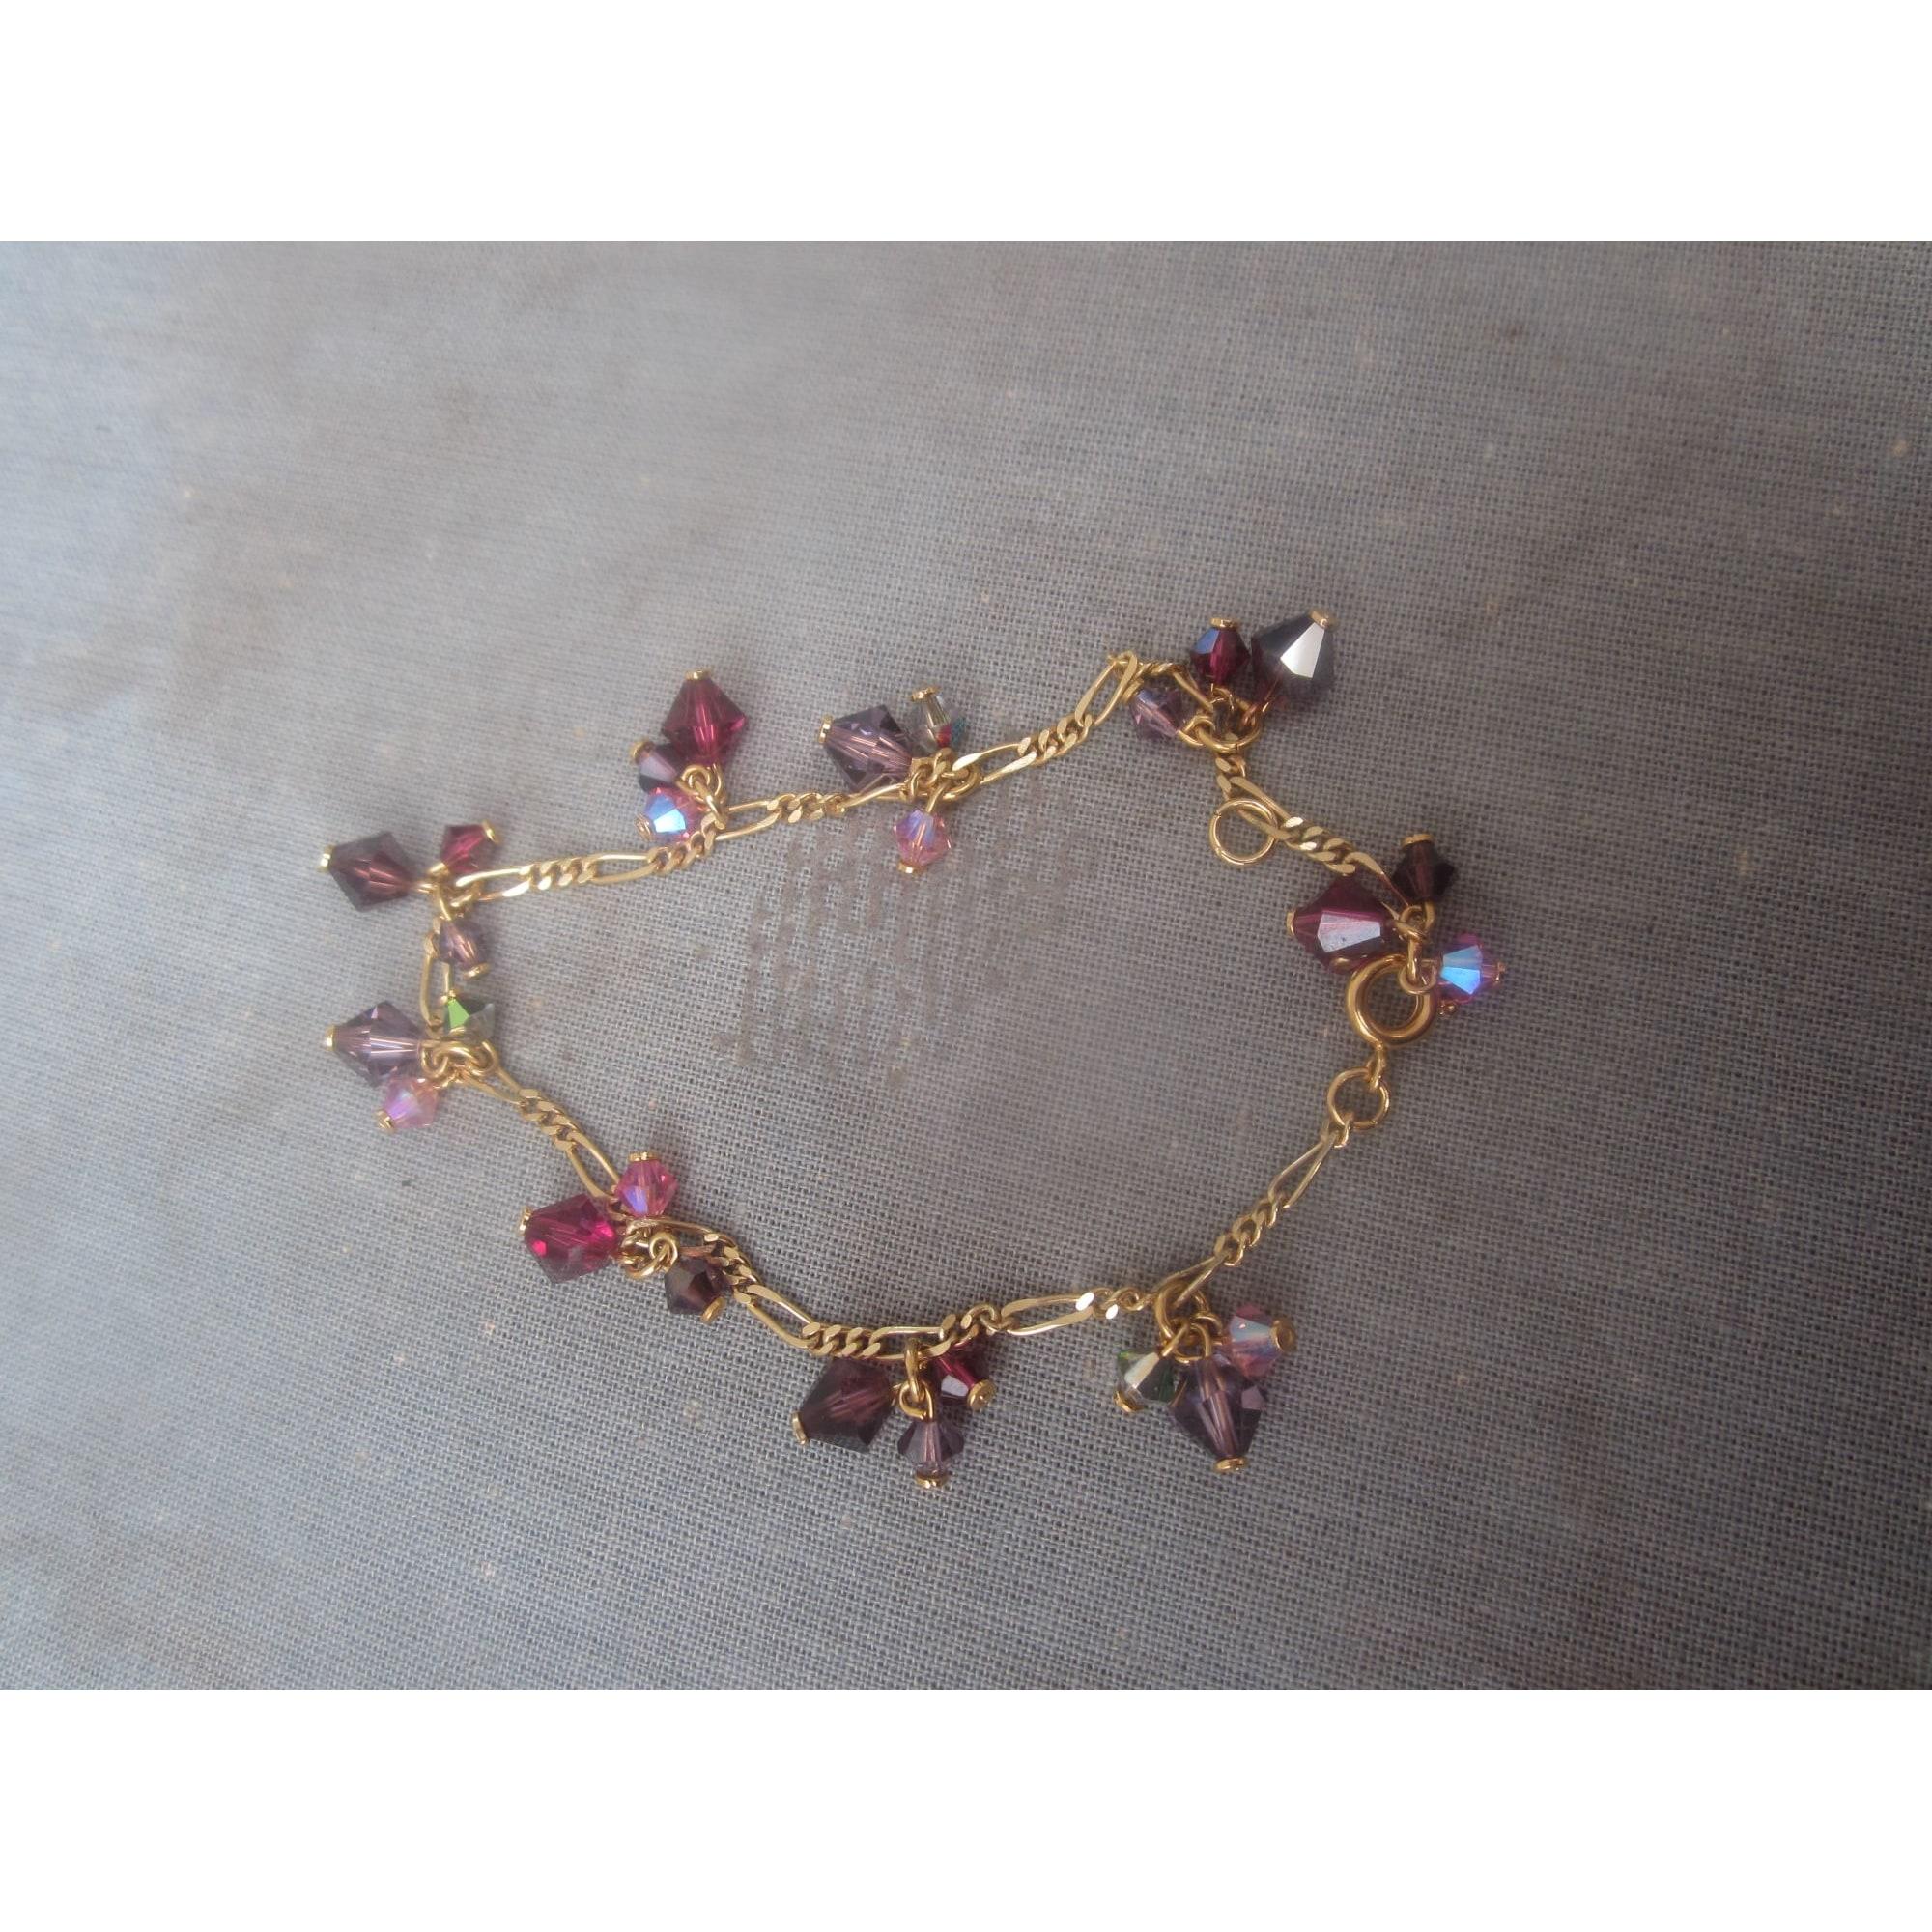 Bracelet MARQUE INCONNUE Rose, fuschia, vieux rose